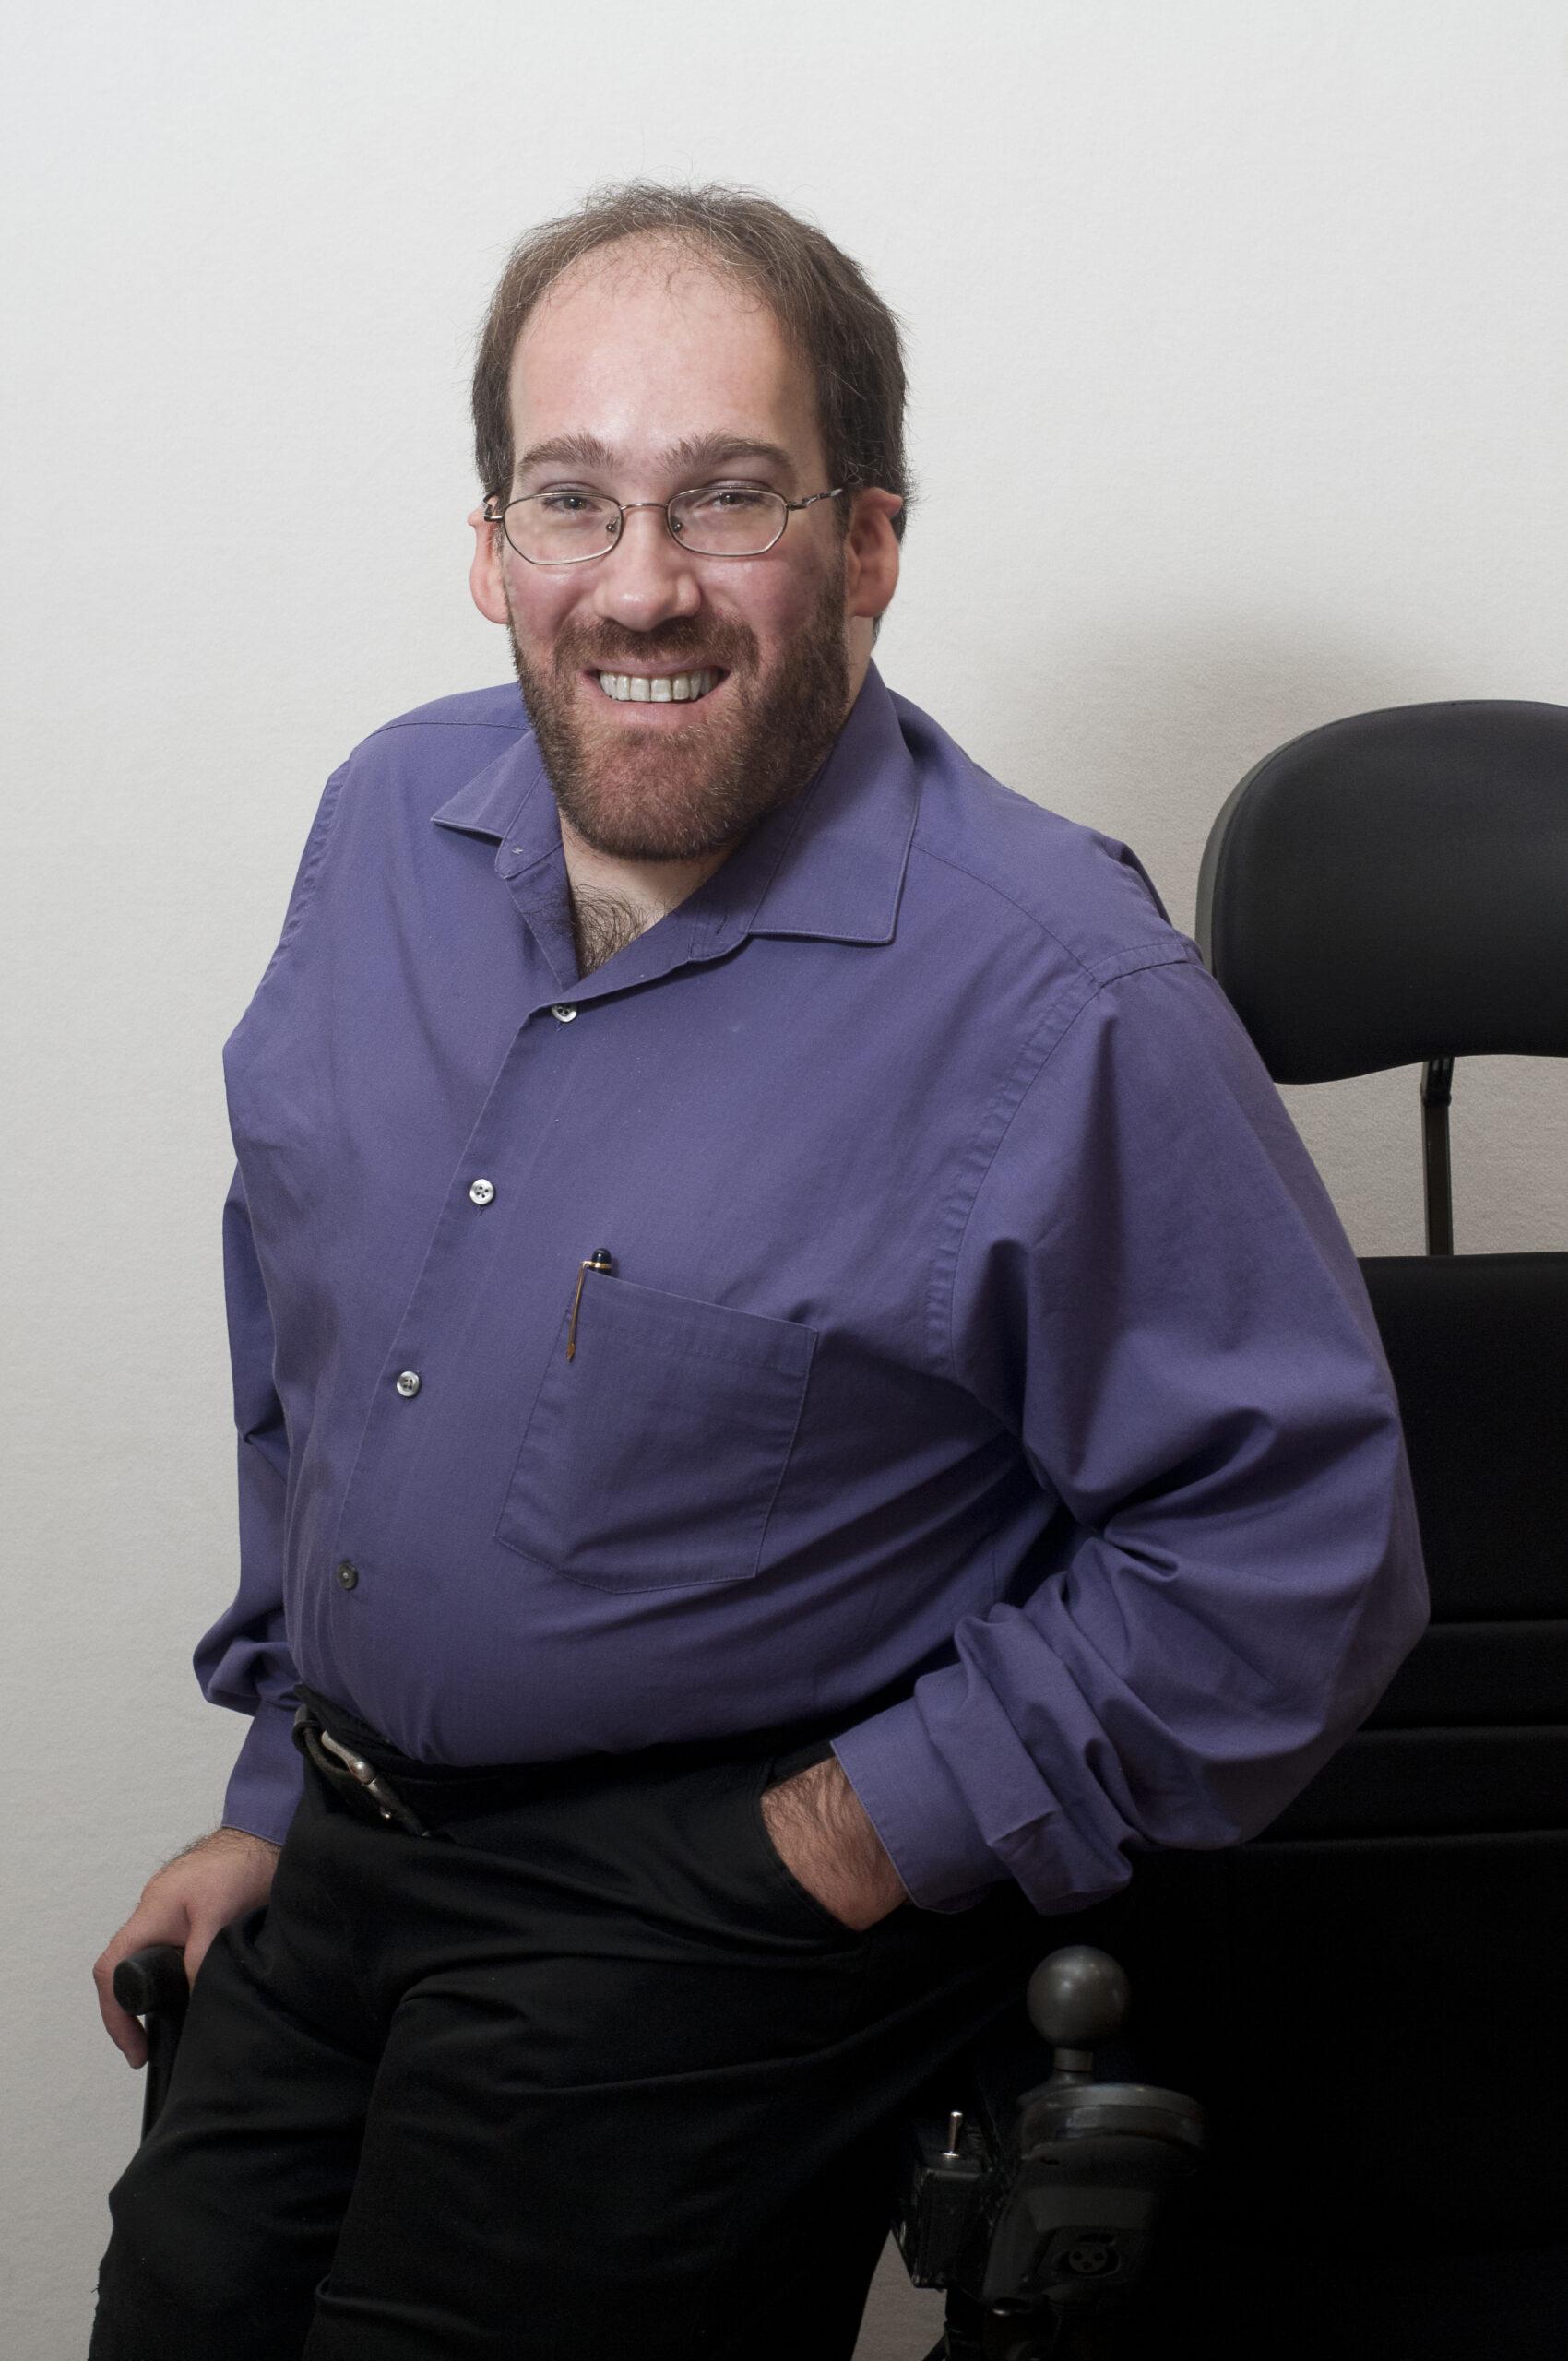 Michael Lifshitz